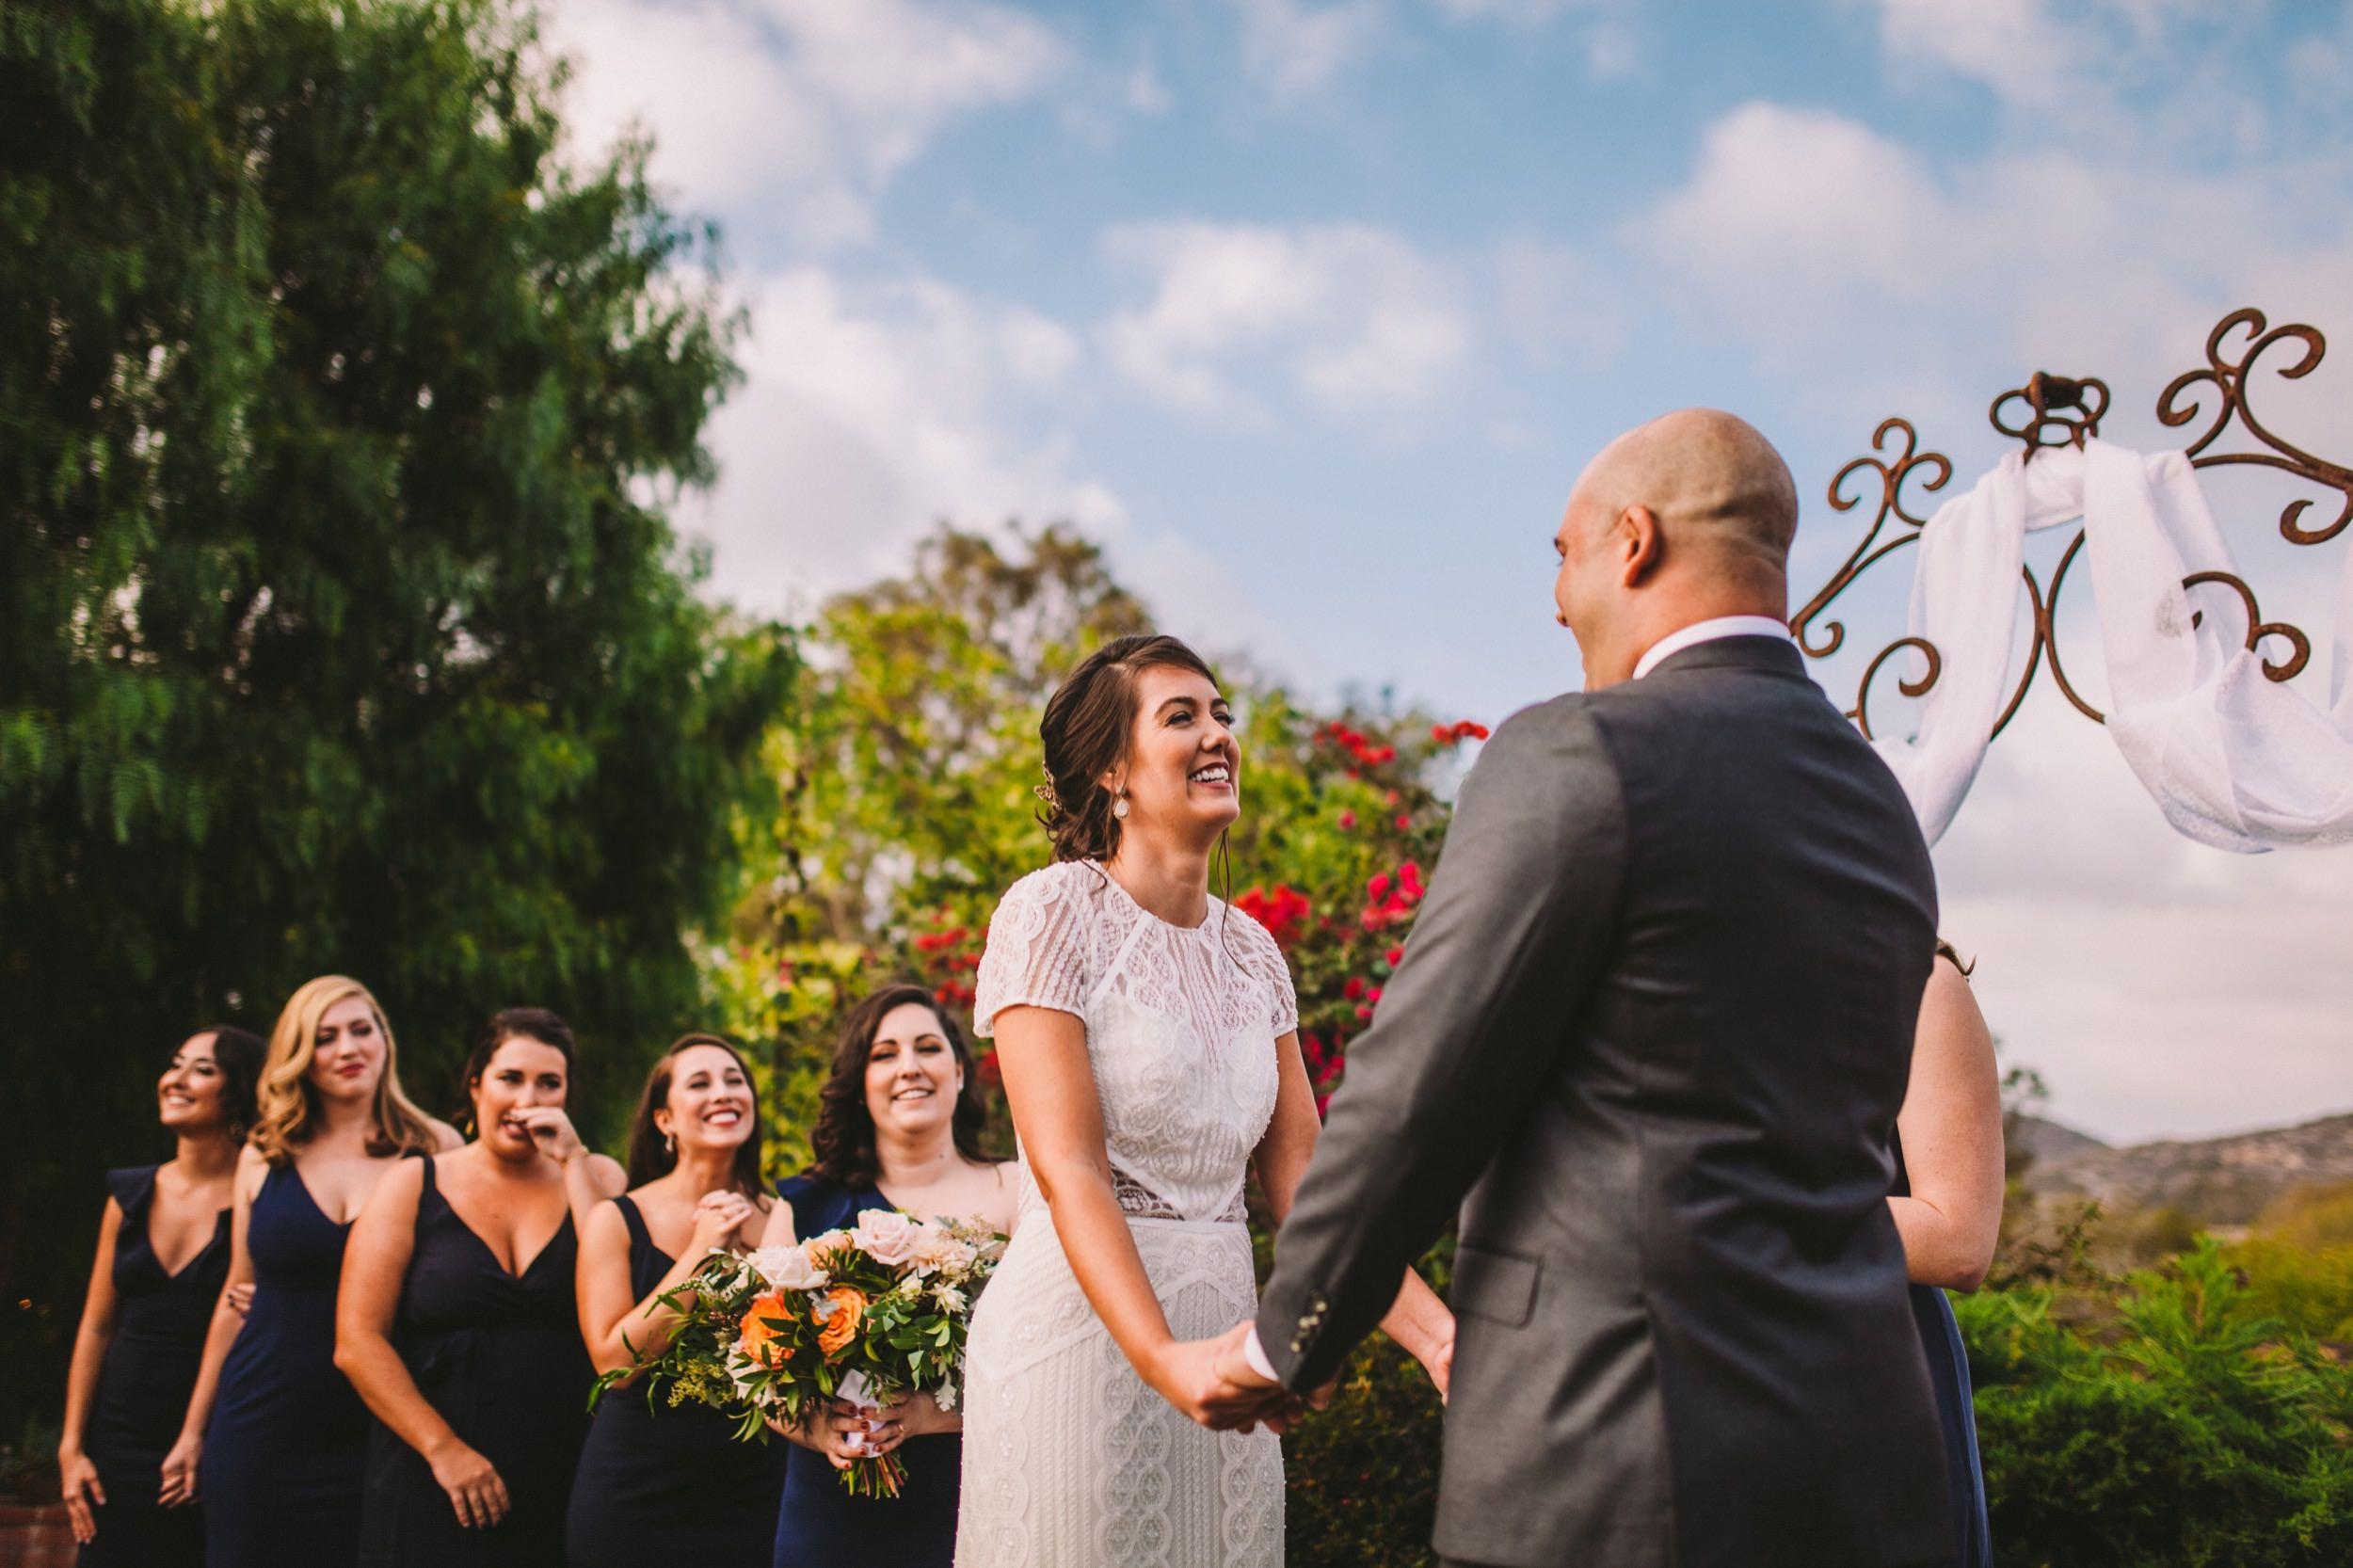 Vibrant & Joyful Documentary Wedding Photography in San Diego